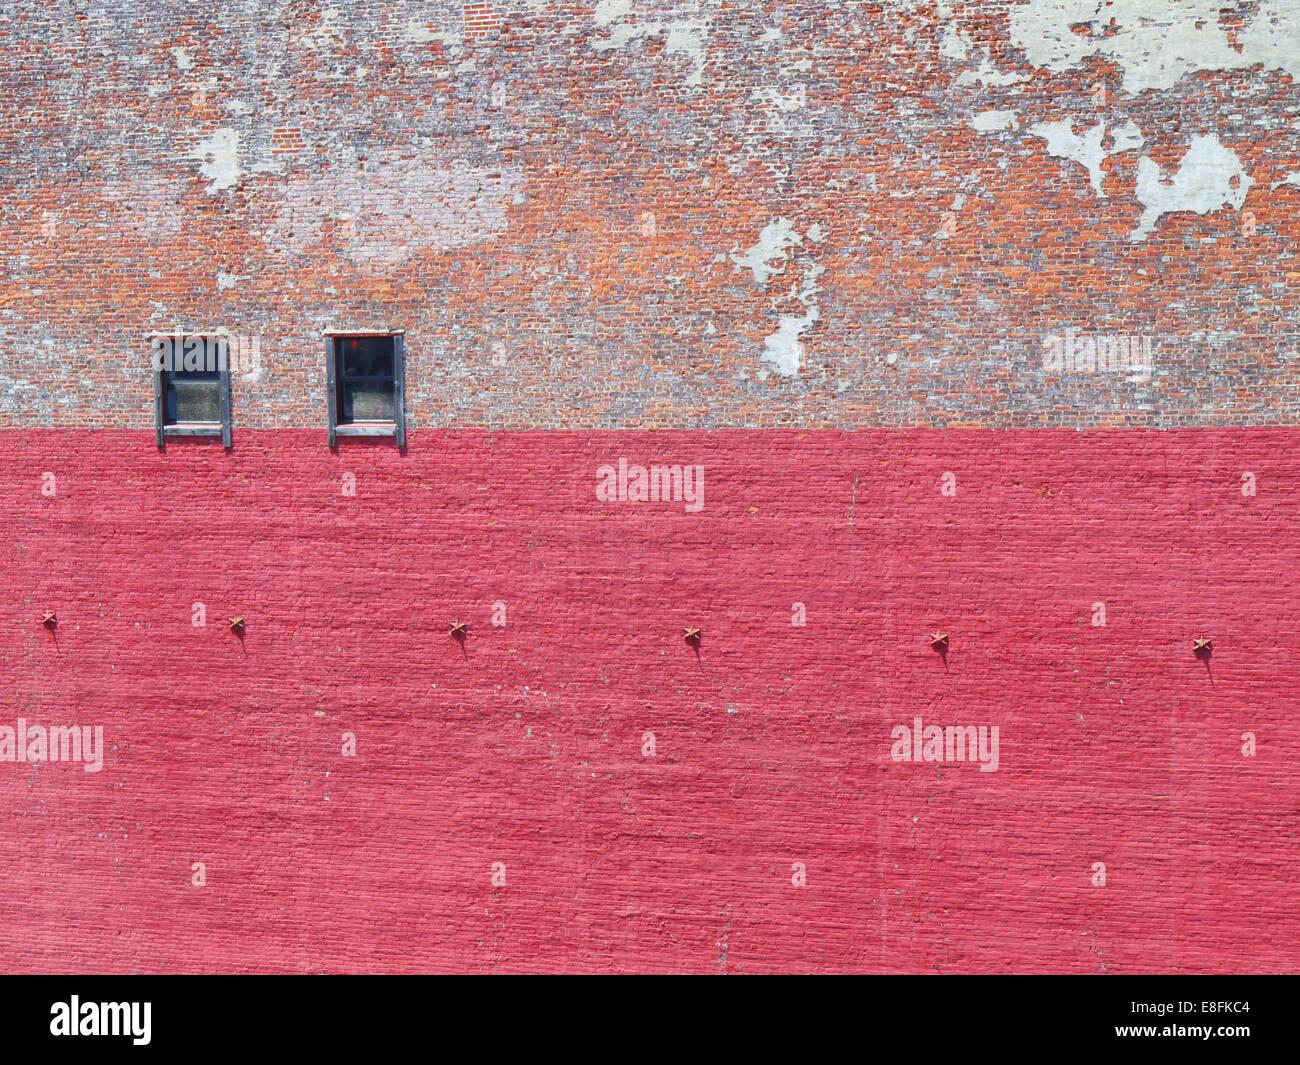 Brick wall with peeling paint - Stock Image